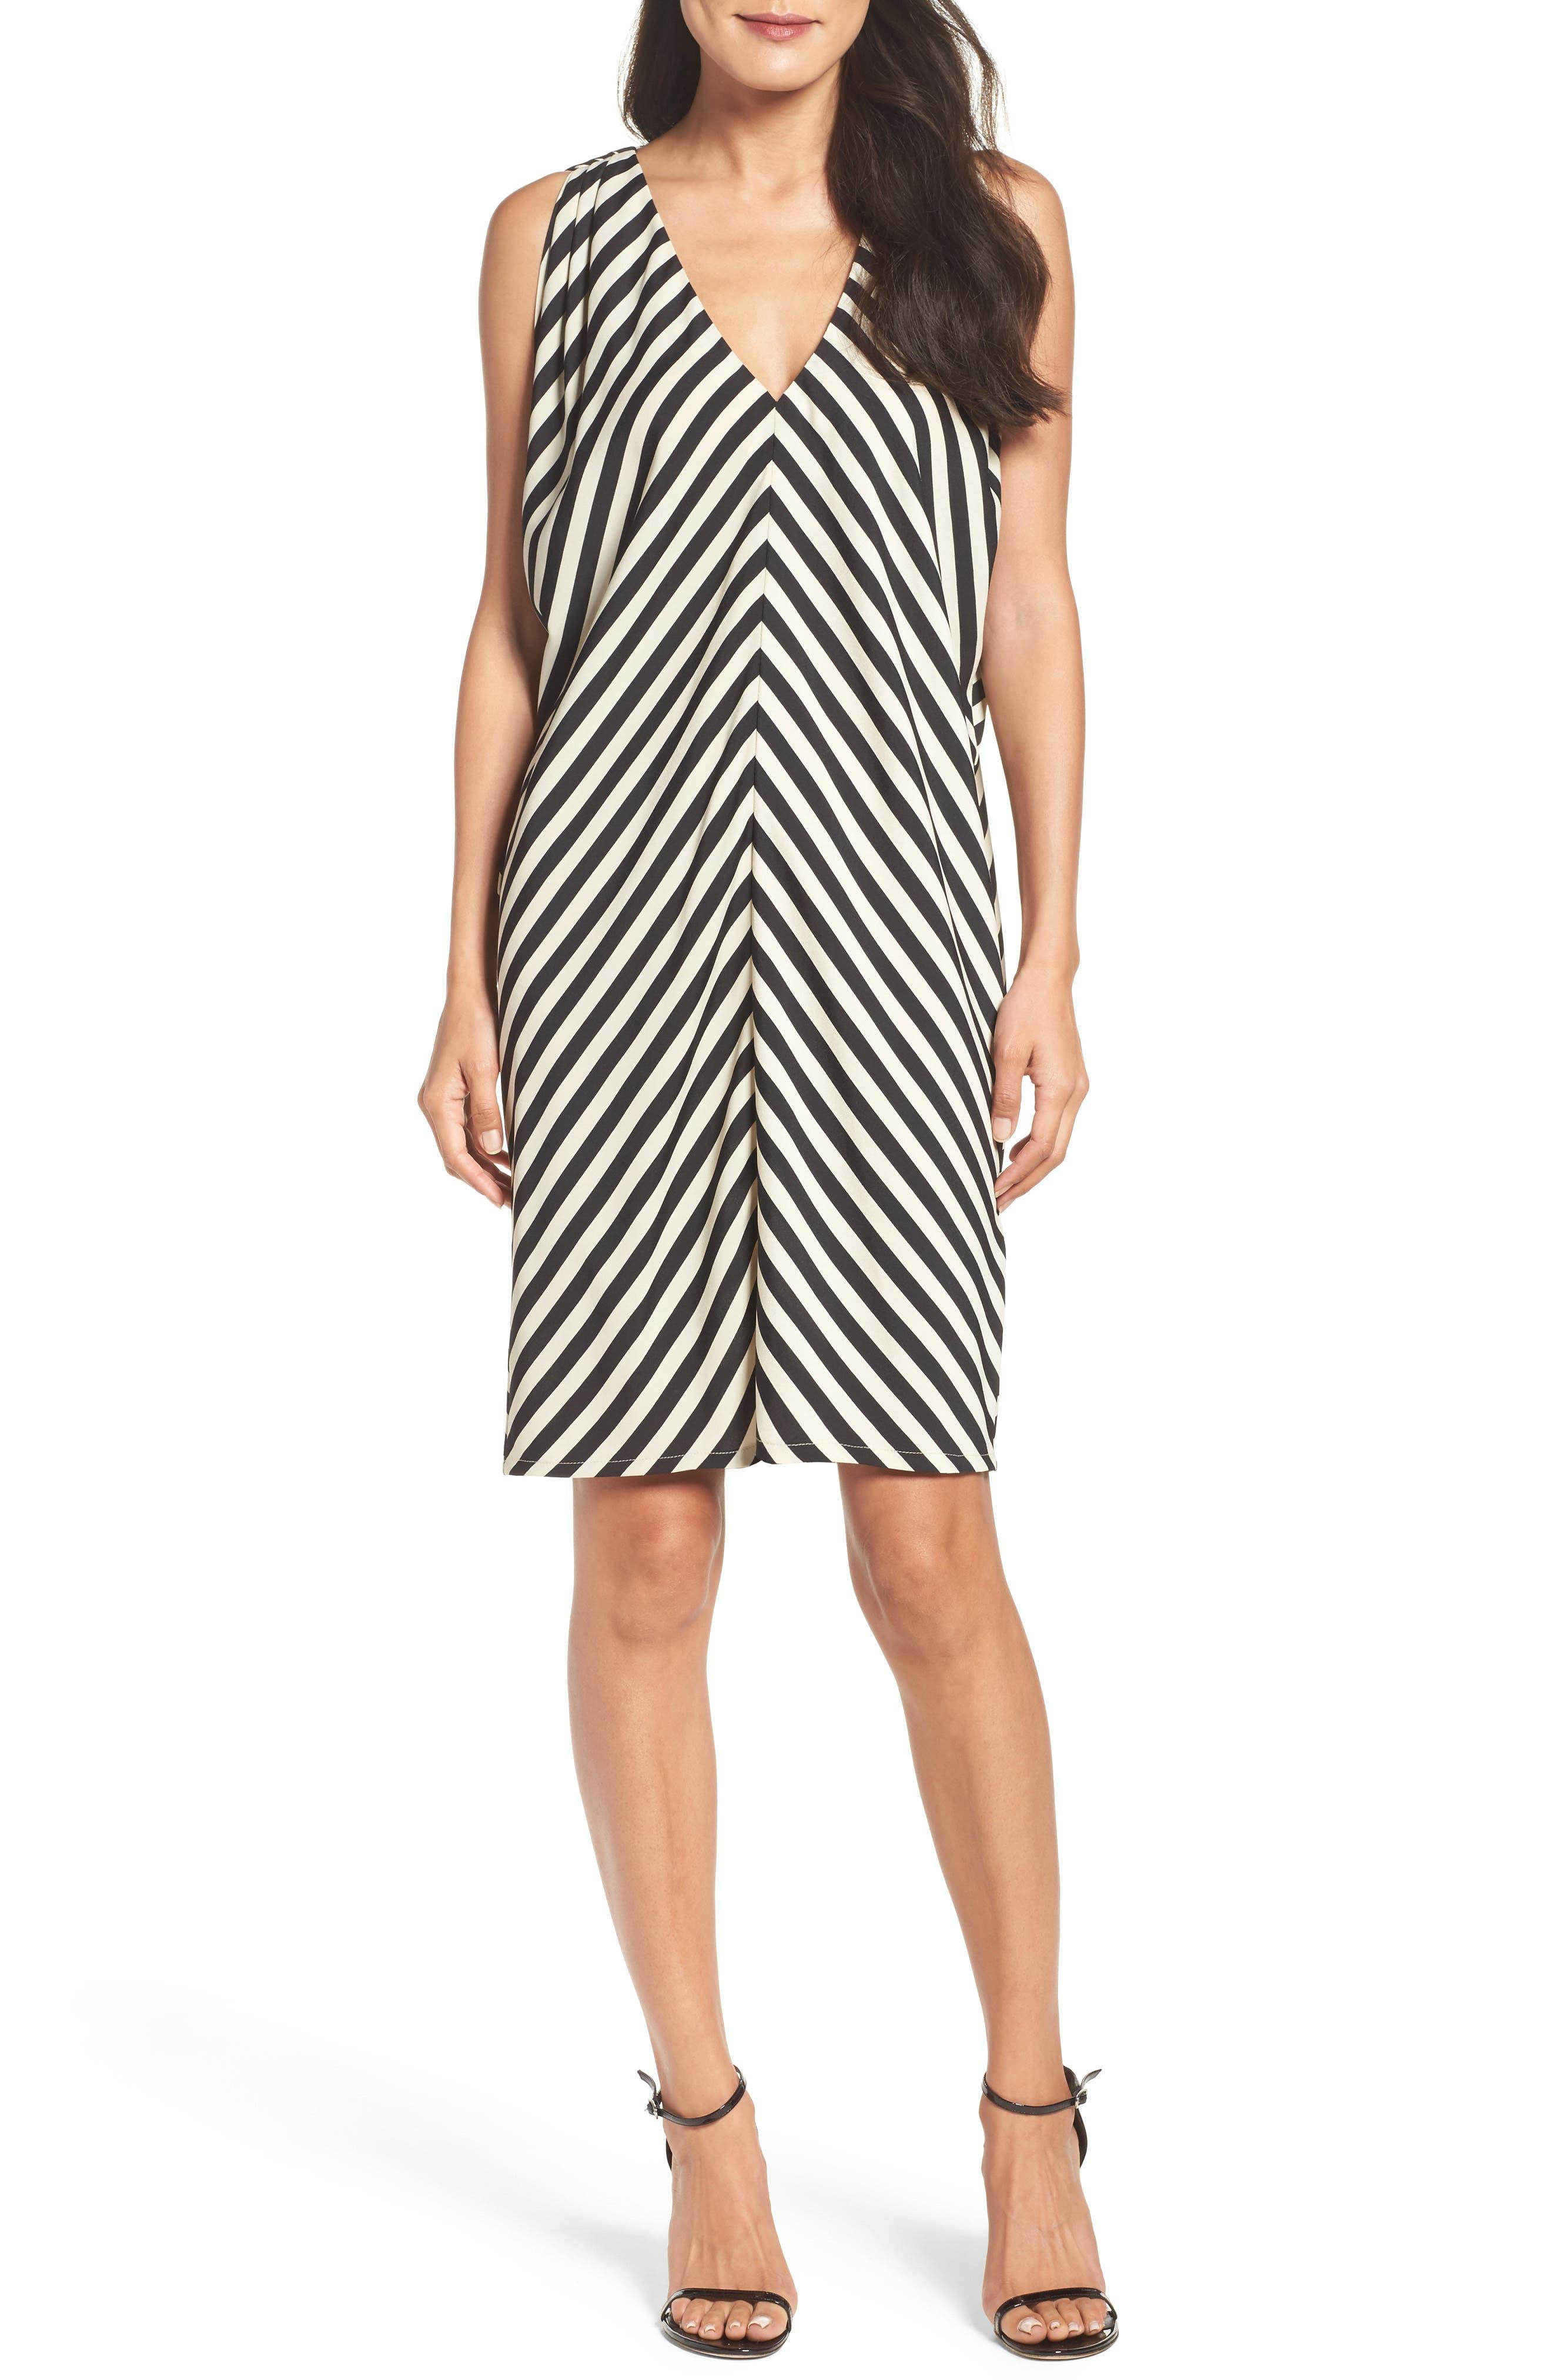 FELICITY & COCO Stripe Shift Dress